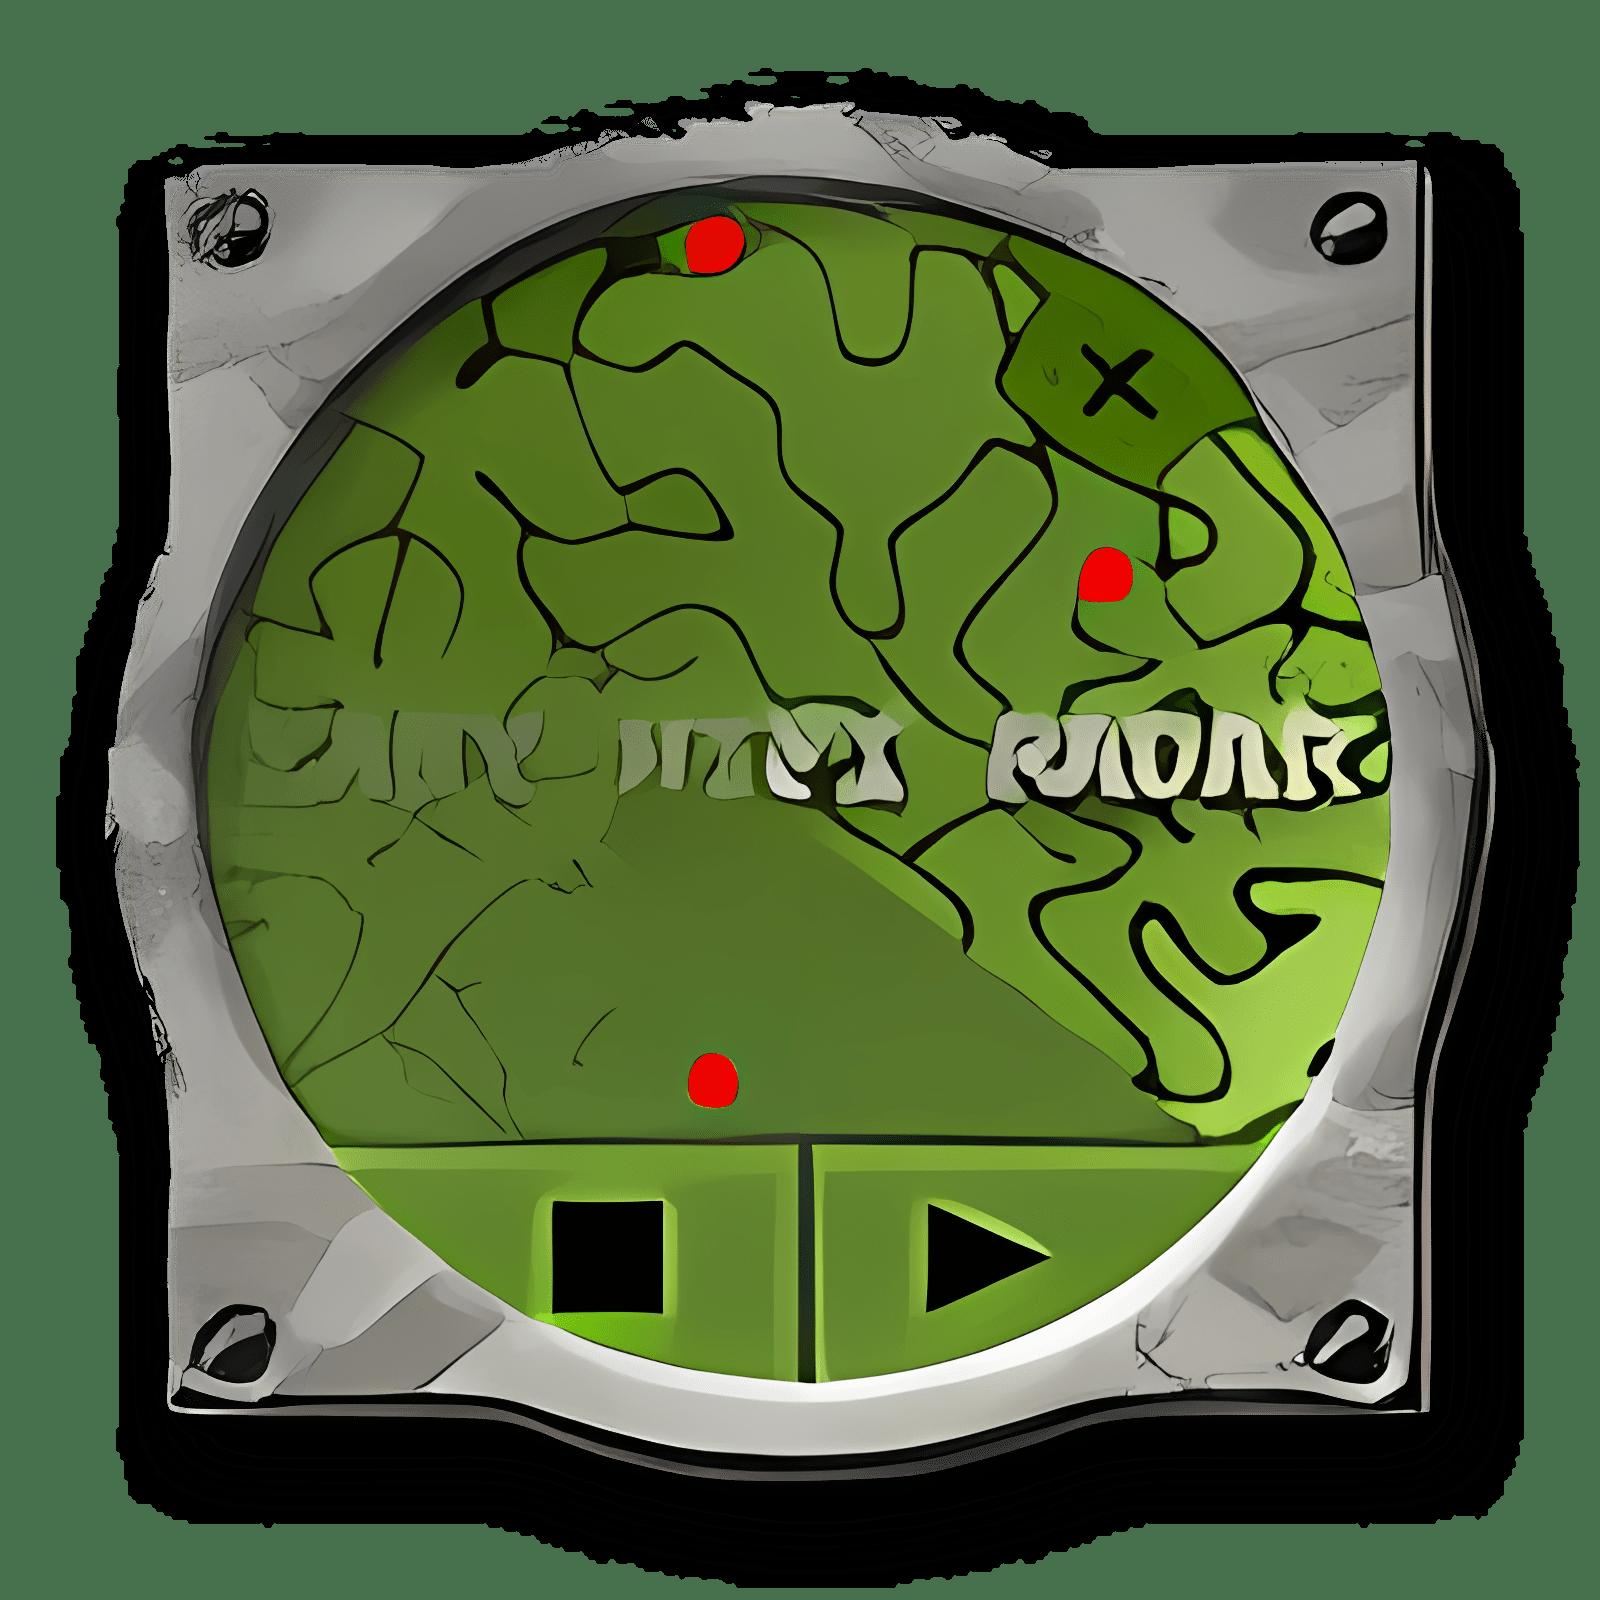 Easy WIFI Radar 1.0.5